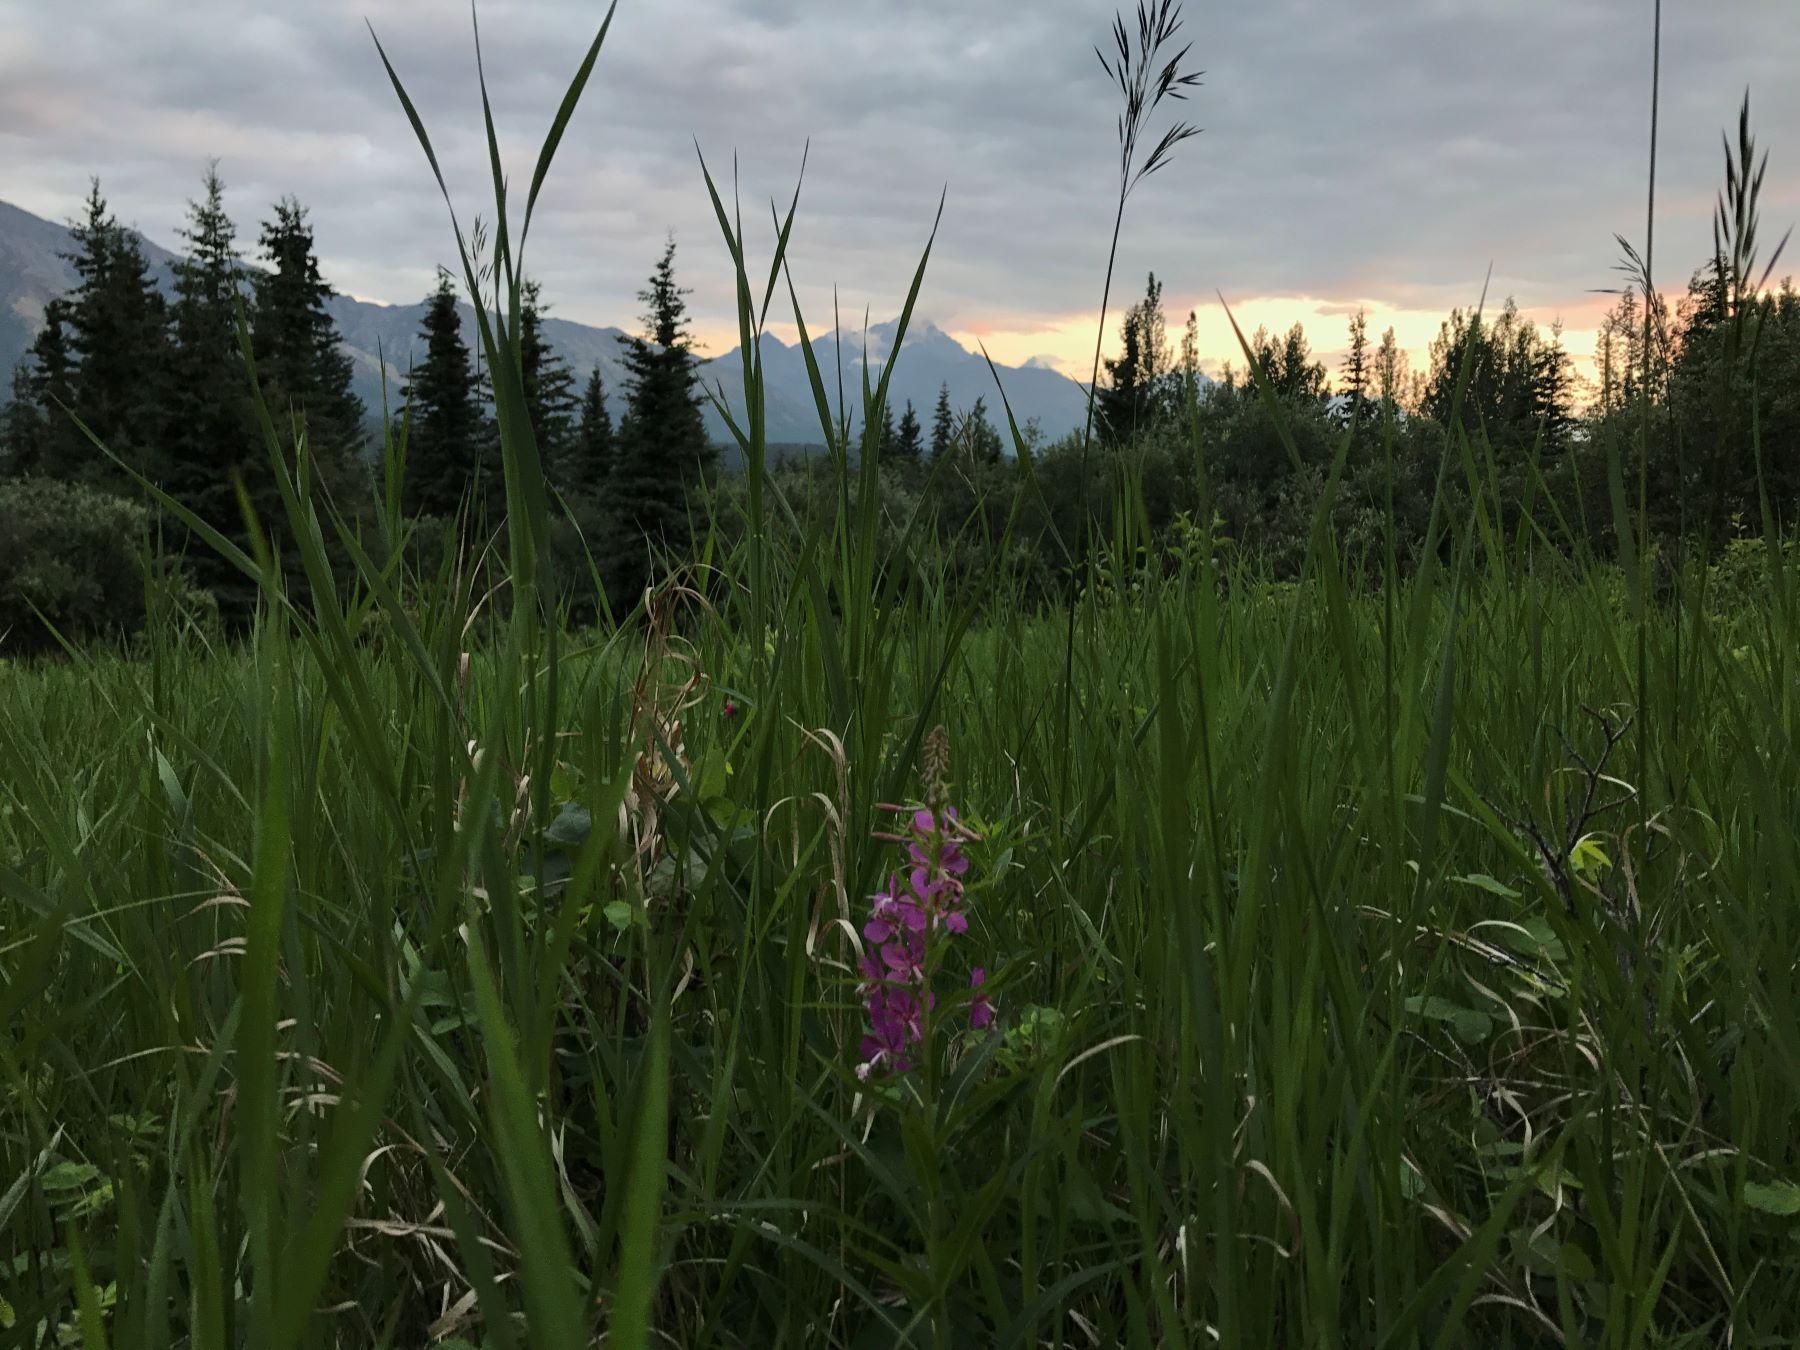 Day Hike Wildflowers